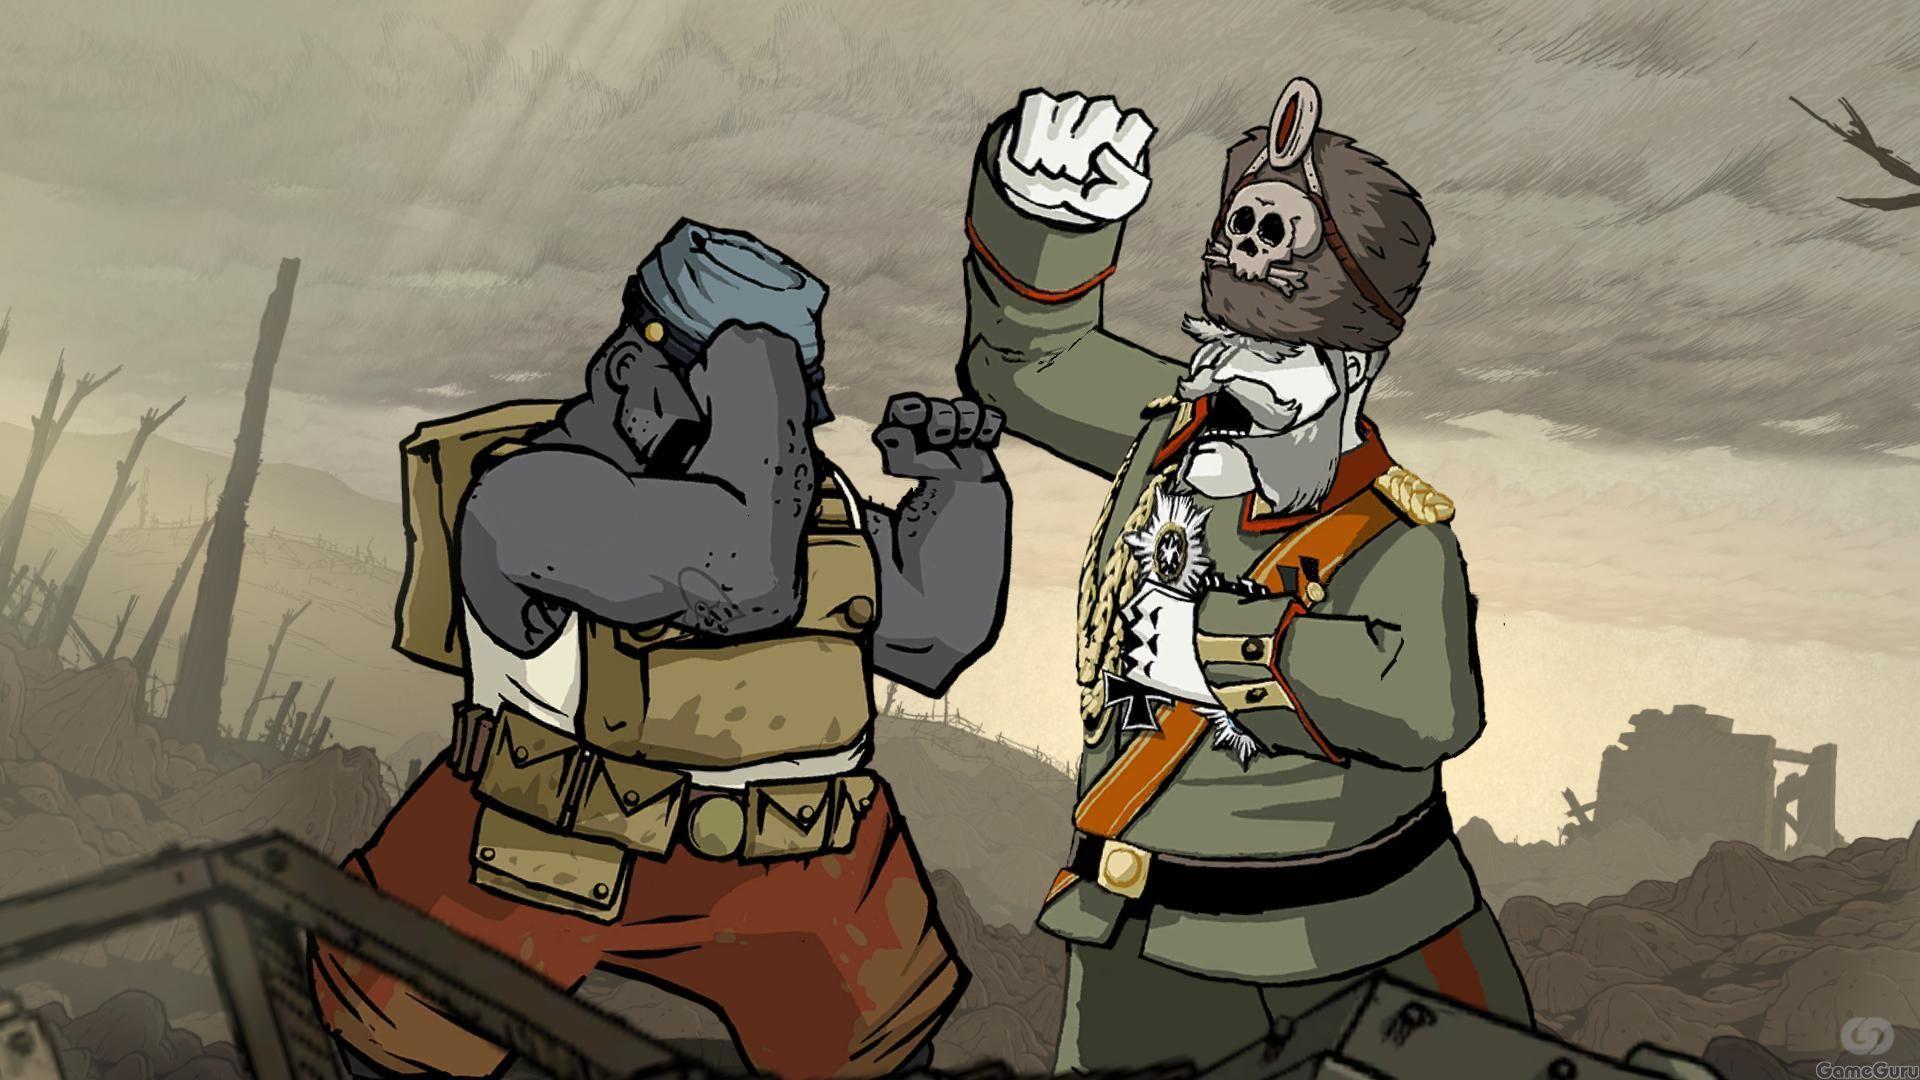 Детсадовский пехотинец. Рецензия на Valiant hearts: The Great War - Изображение 9